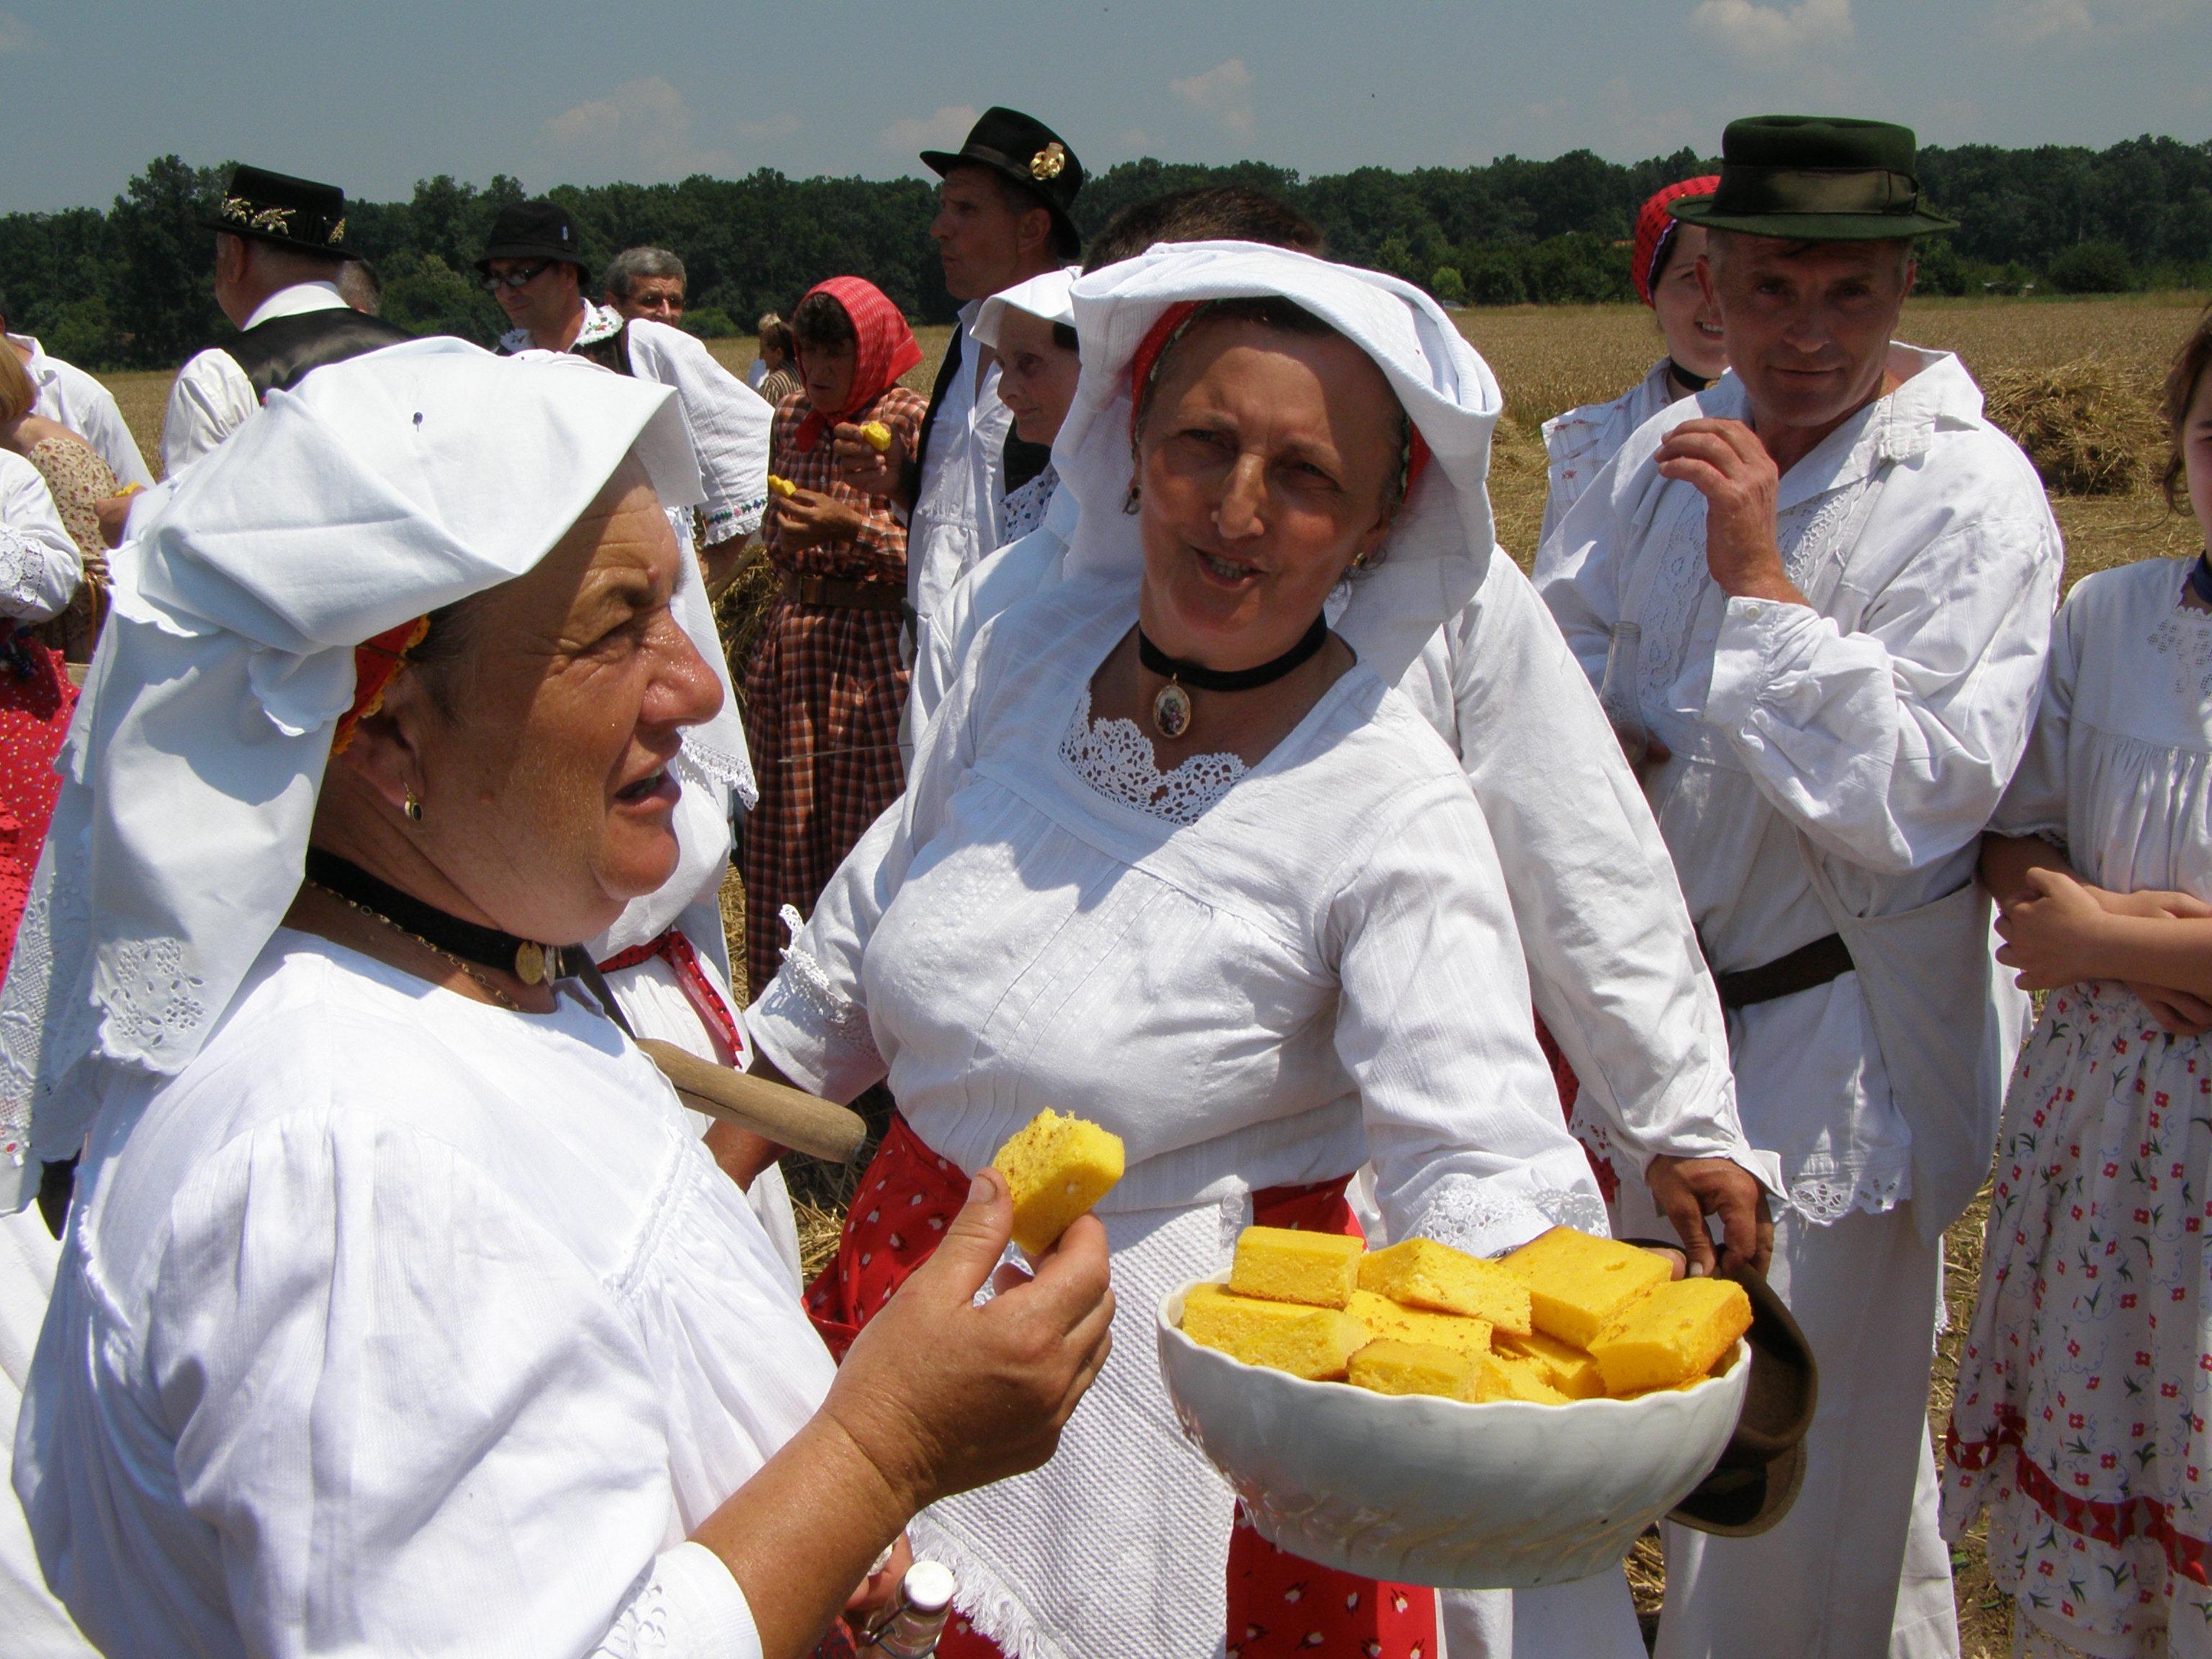 Kruh naš svagdašnji - žetva i vršidba u prošlosti